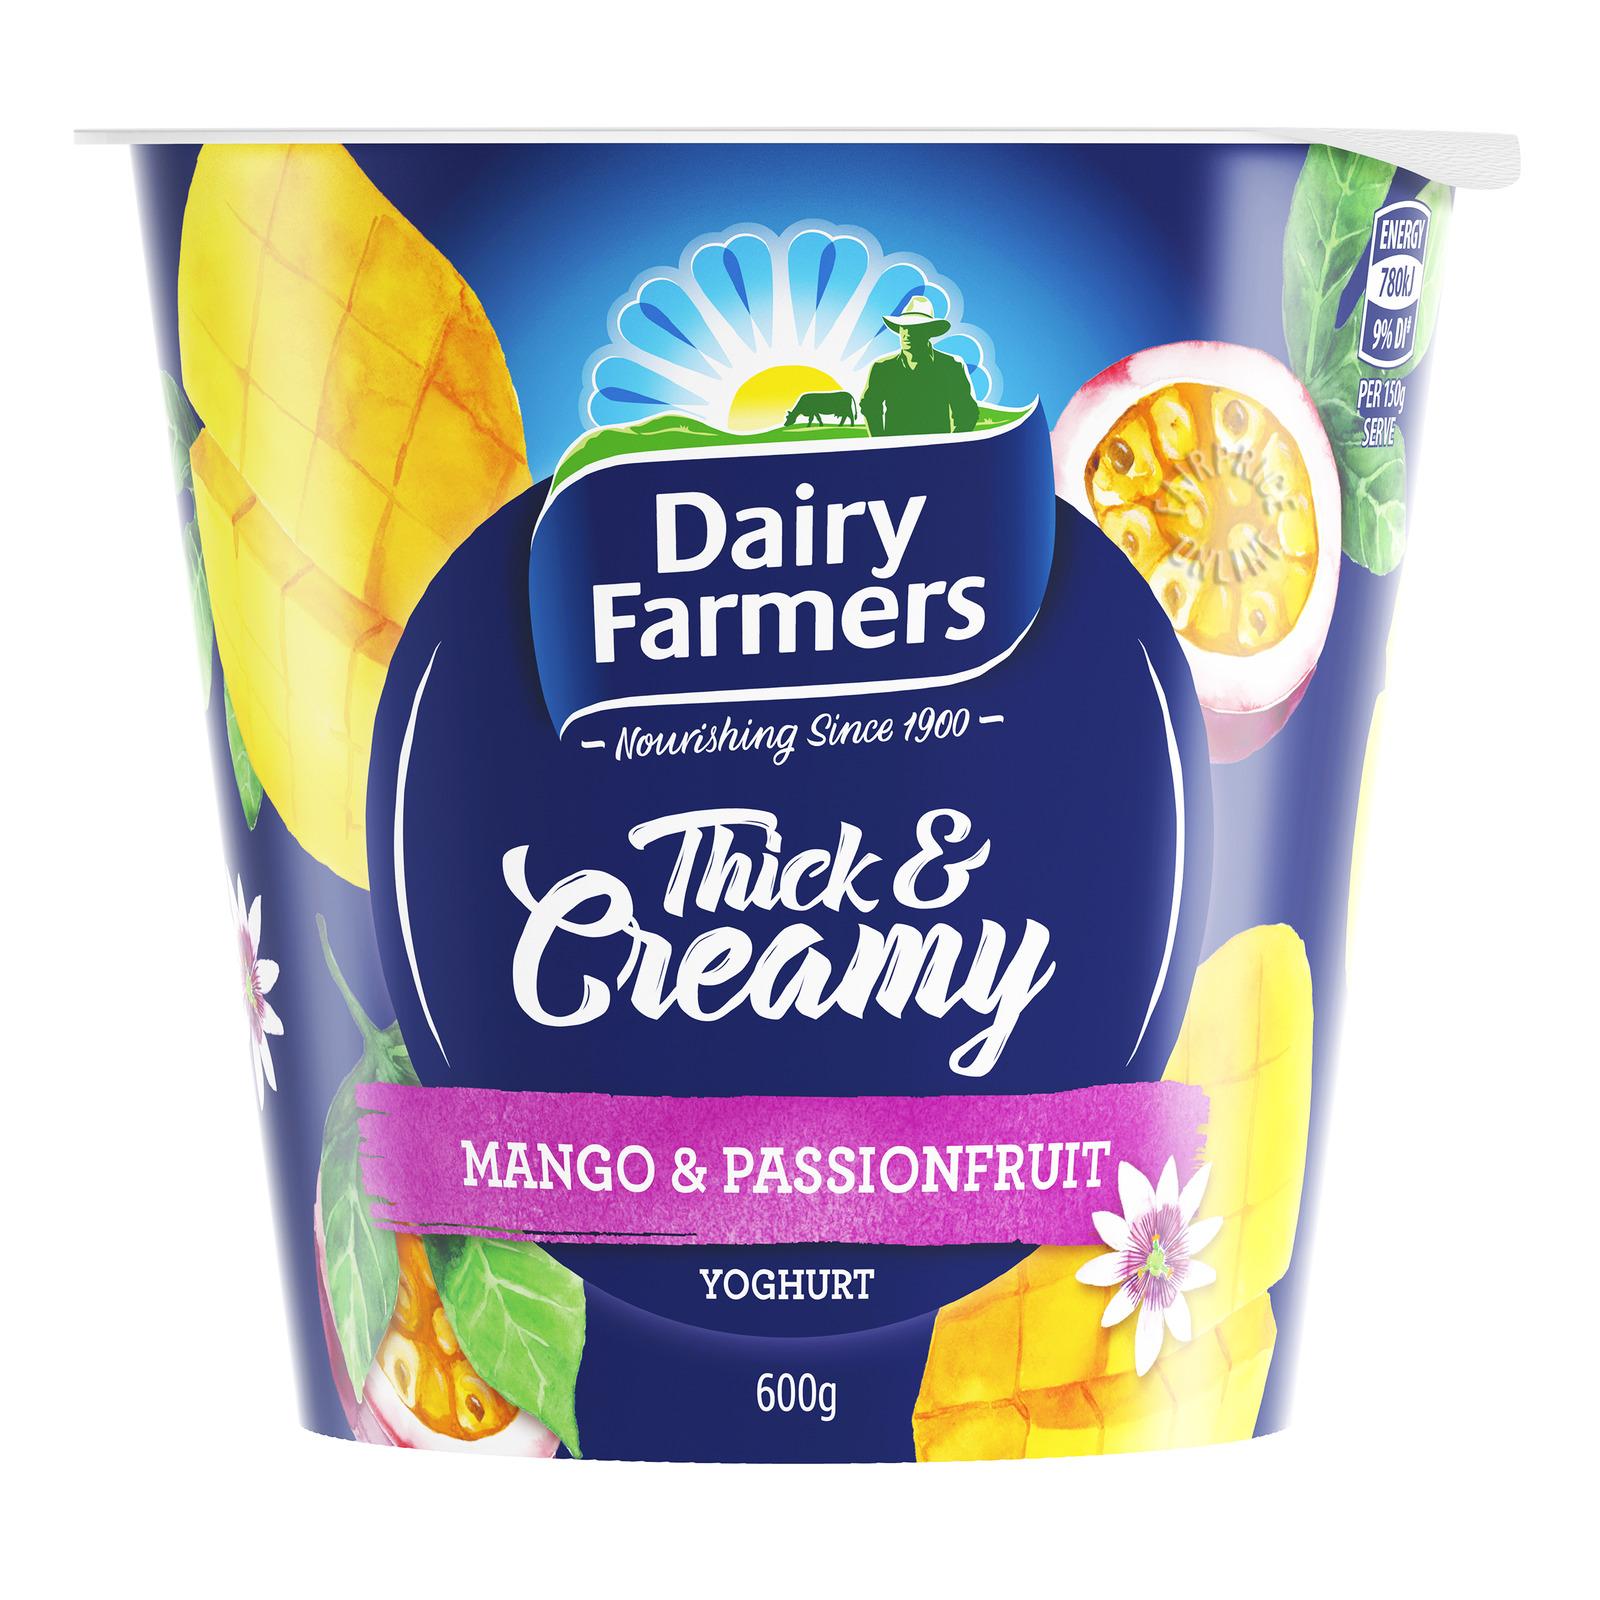 DAIRY FARMERS Yoghurt Thick & Creamy Mango Passionfruit 600g